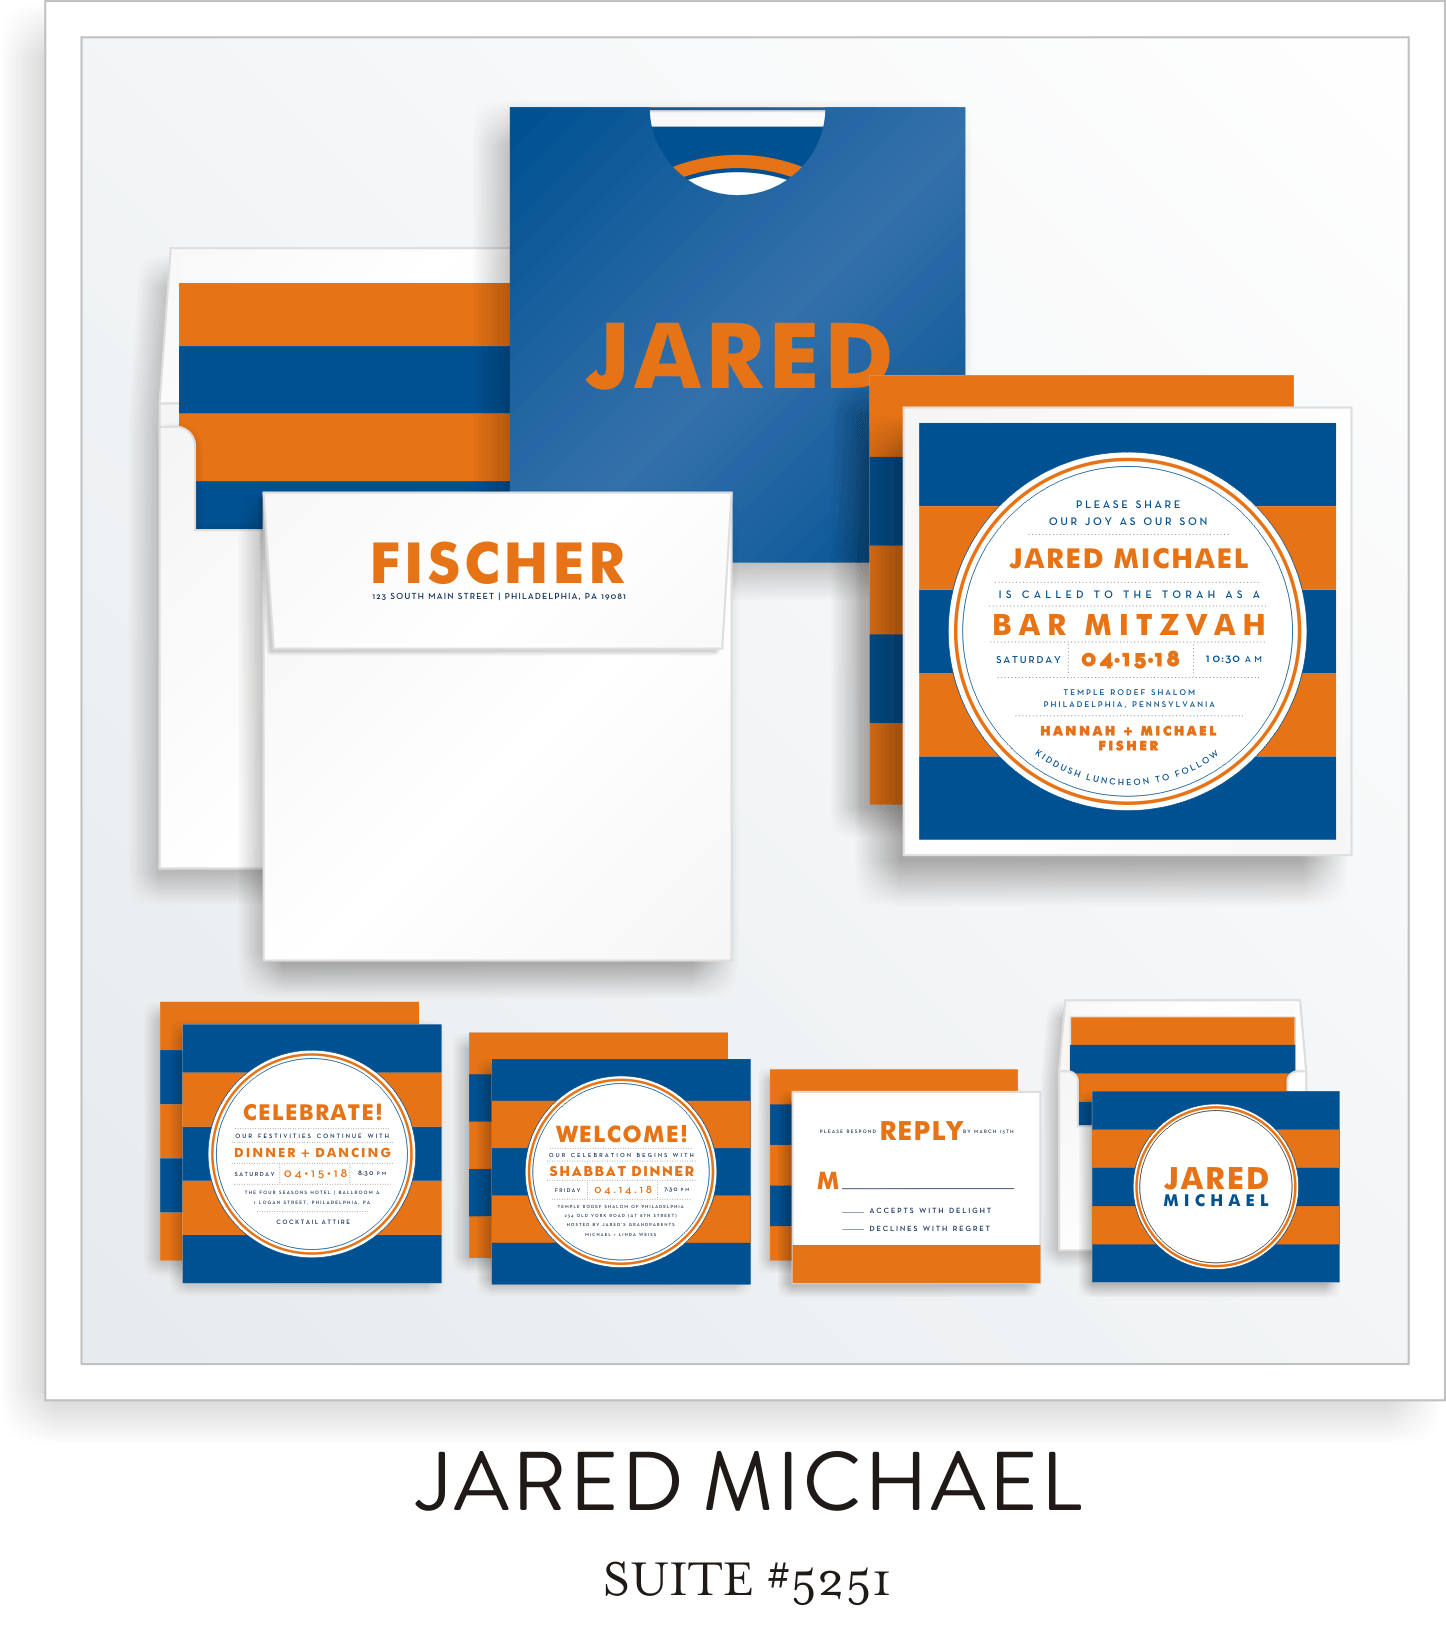 Copy of Copy of Bar Mitzvah Invitation Suite 5251 - Jared Michael